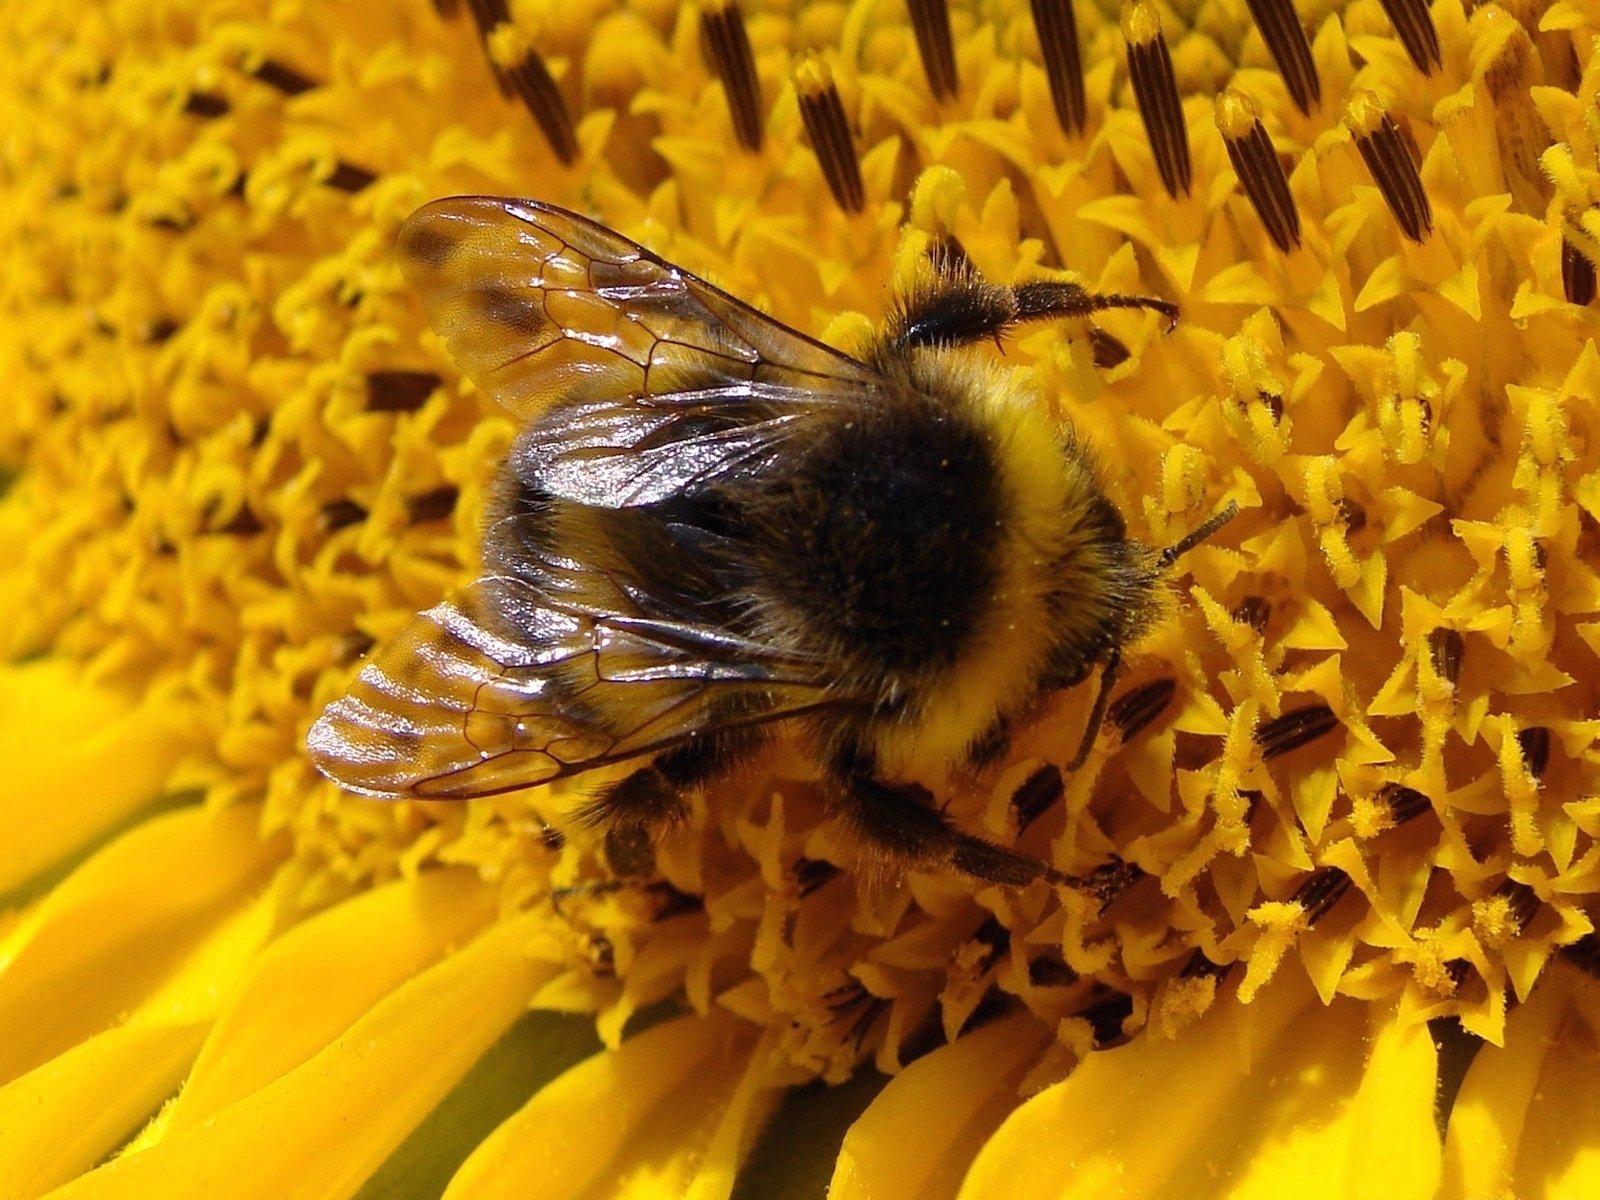 Bumblebee wallpaper and background image 1600x1200 id - Bumblebee desktop wallpapers ...